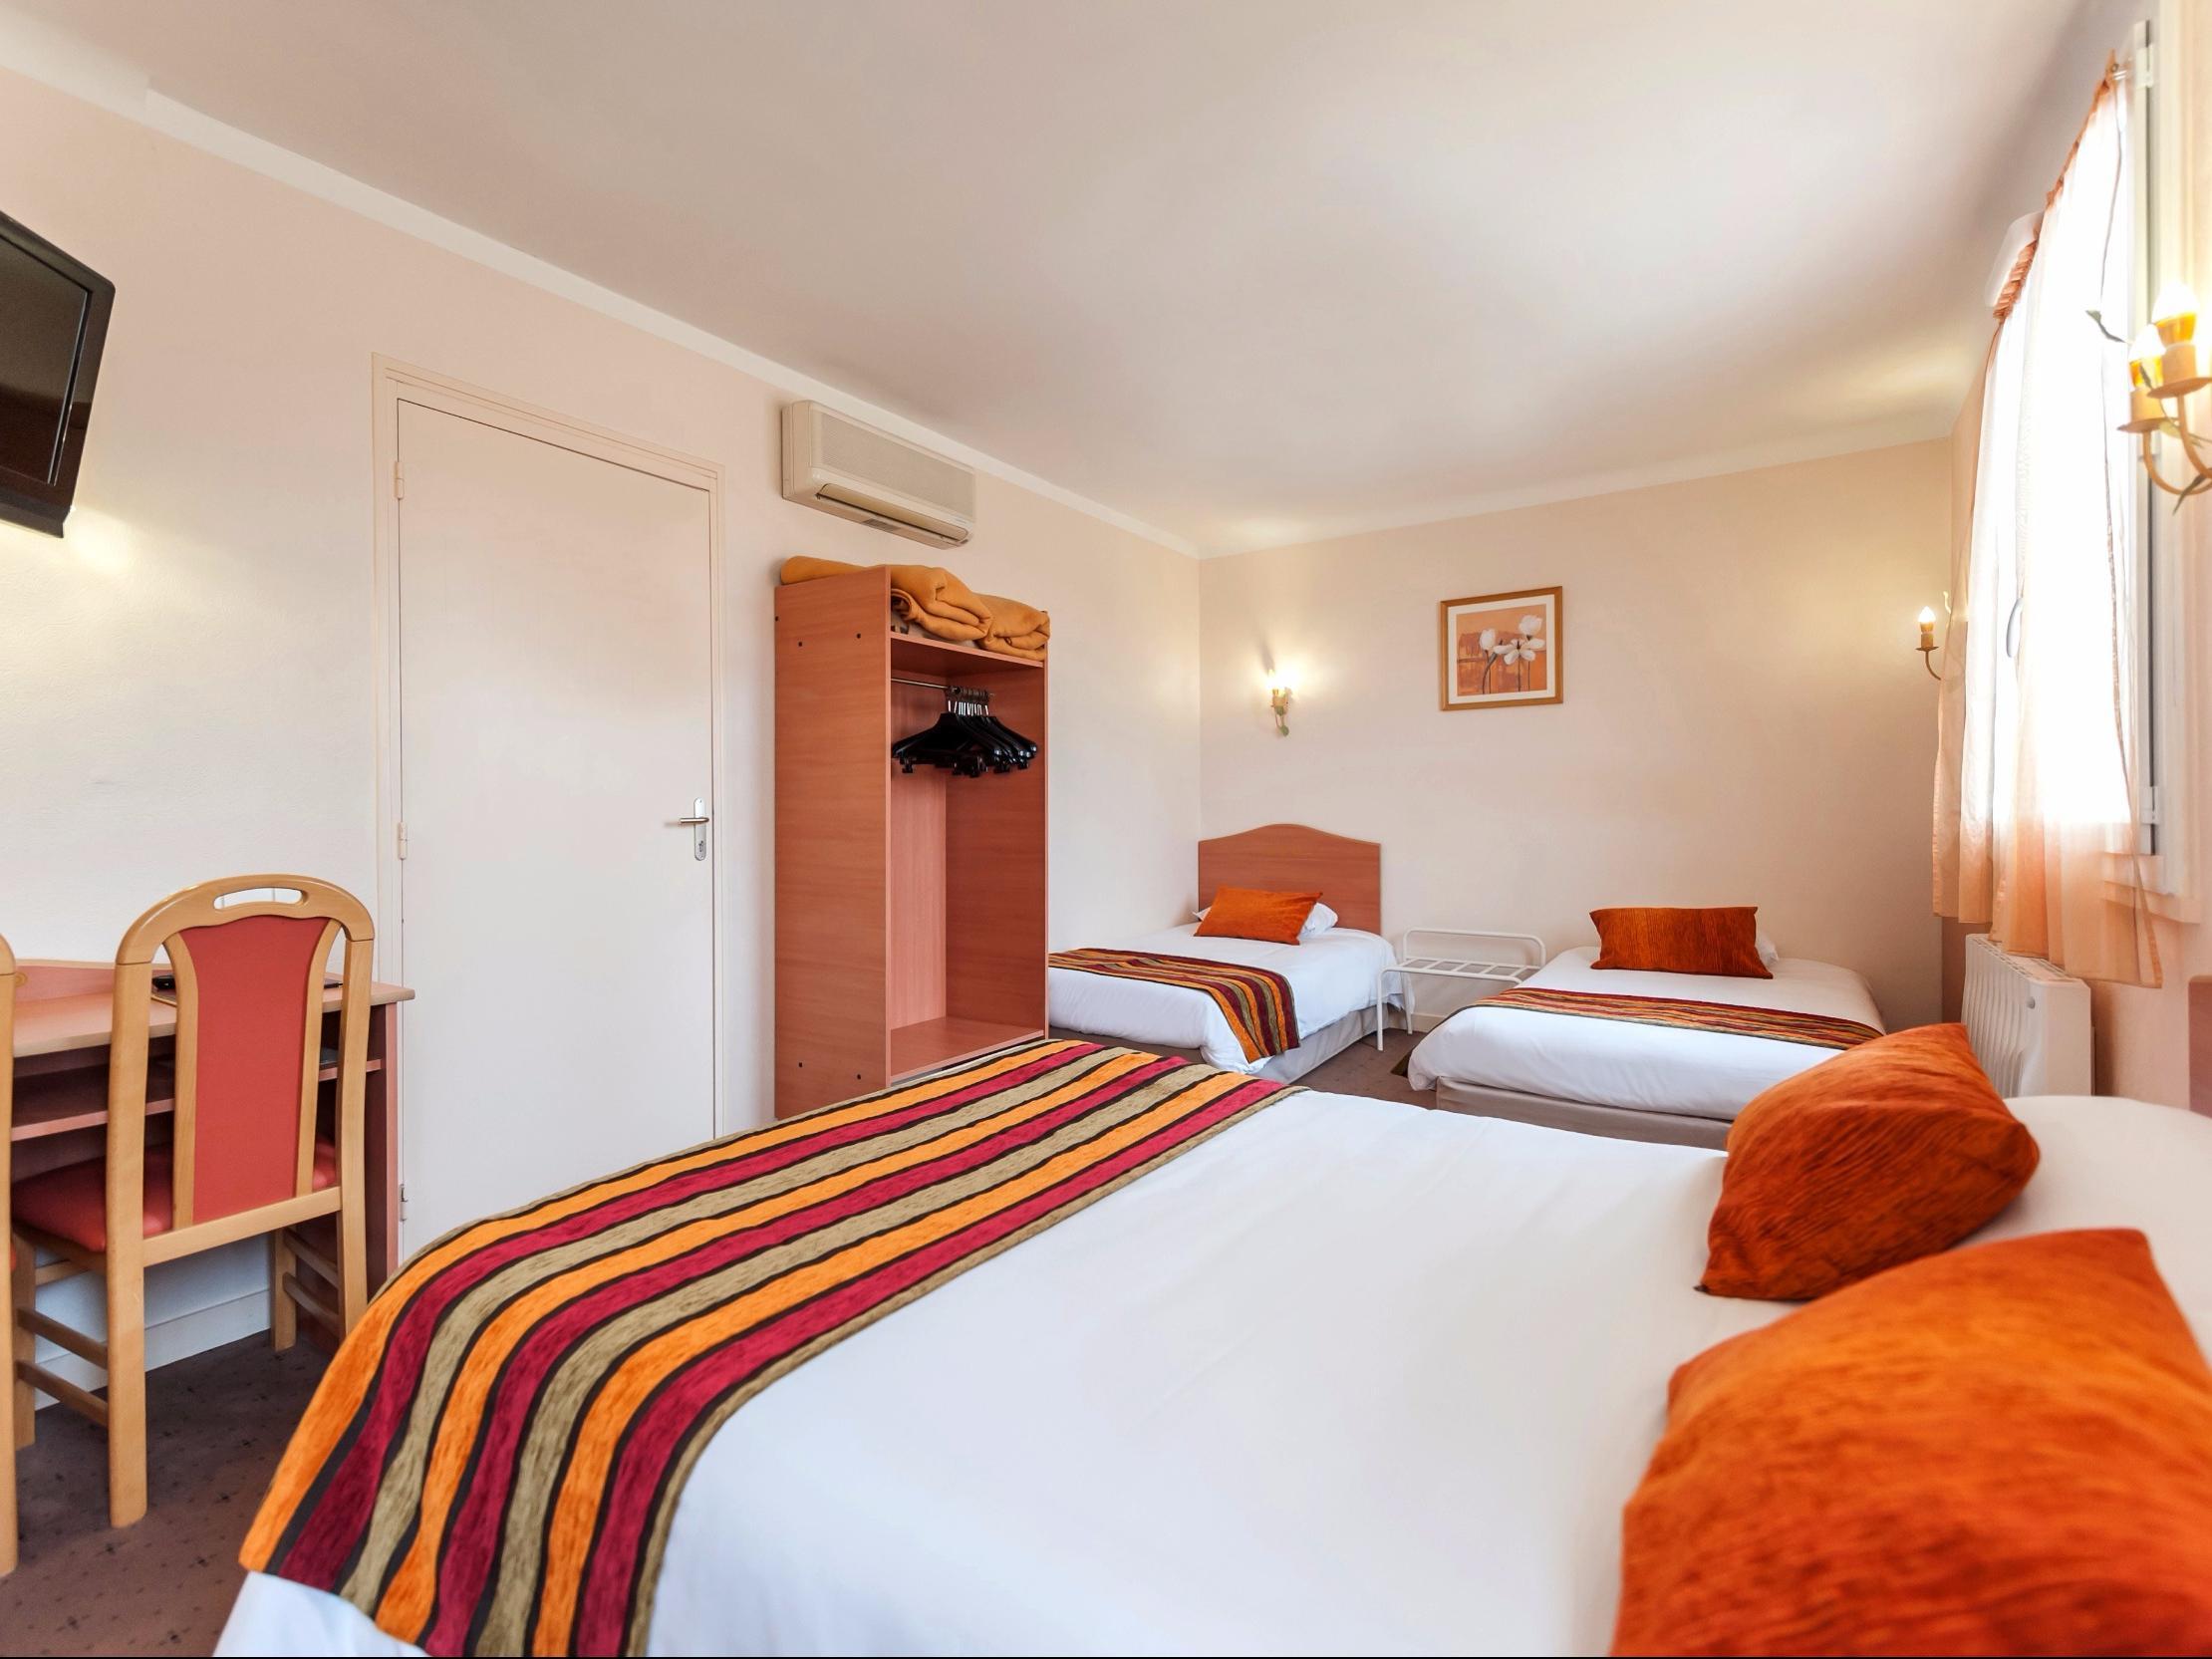 Hotel sandrina niort for Hotels niort